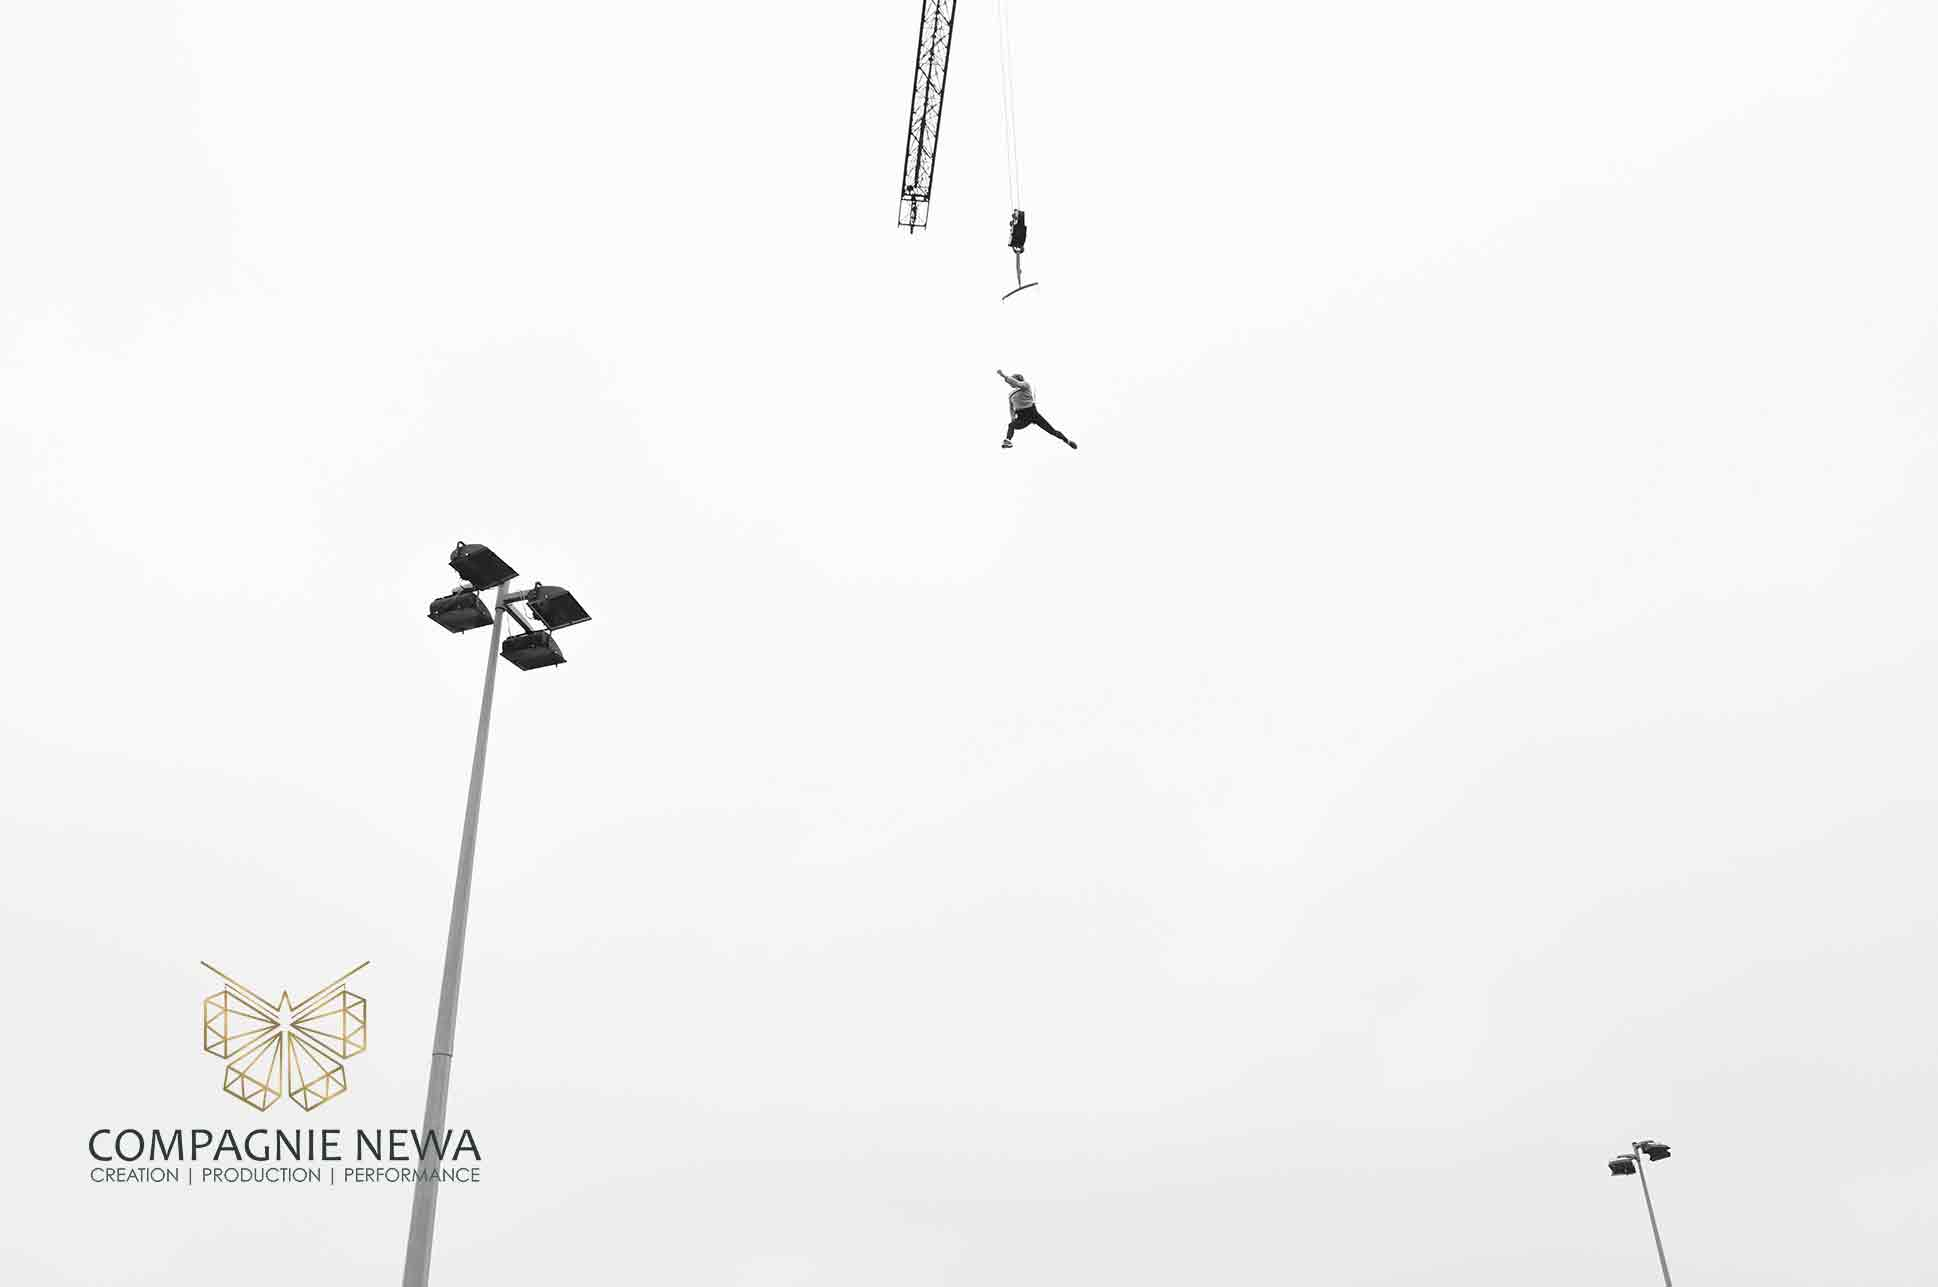 Compagnie_NEWA_oudoor_performance_aerials_crane_harness